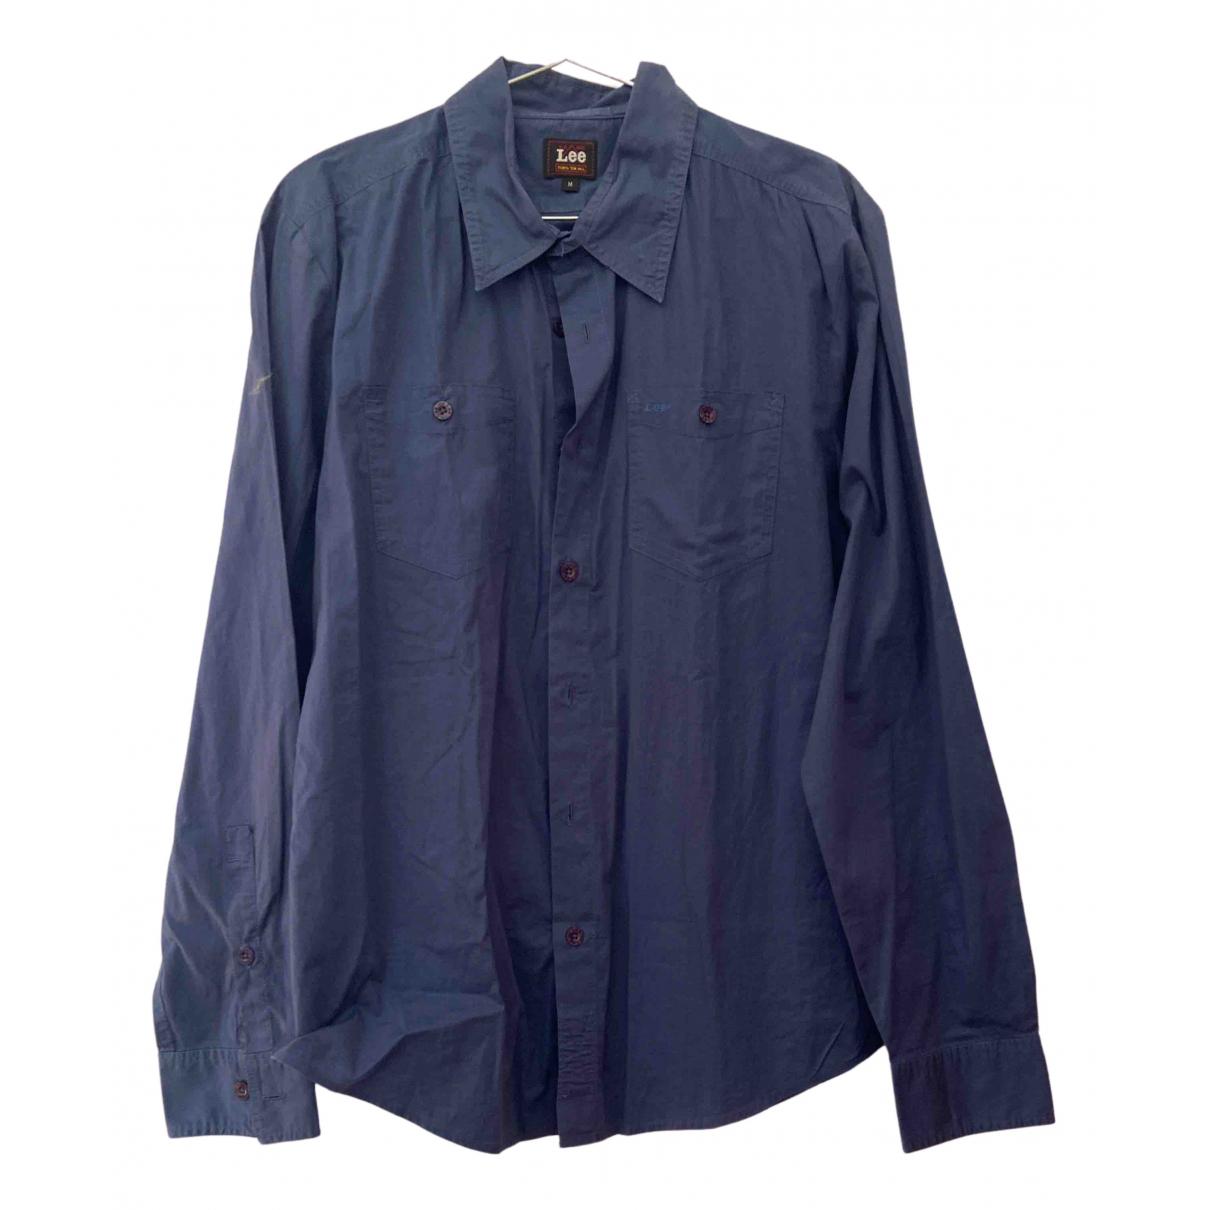 Lee \N Blue Cotton Shirts for Men M International